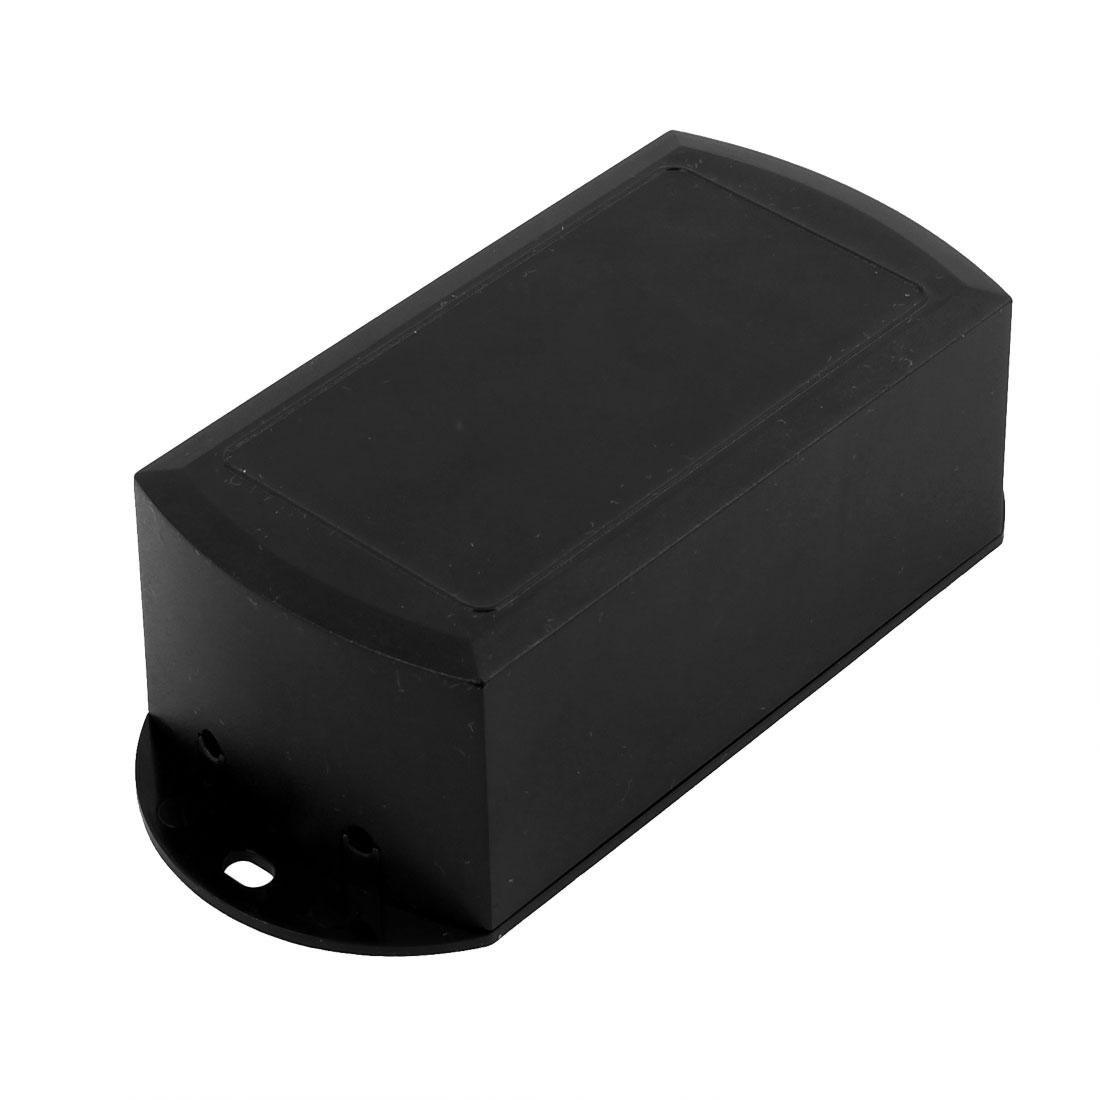 XL-169 117x52x36mm Flame Retardant Enclosure Junction Box for LED Driver Black